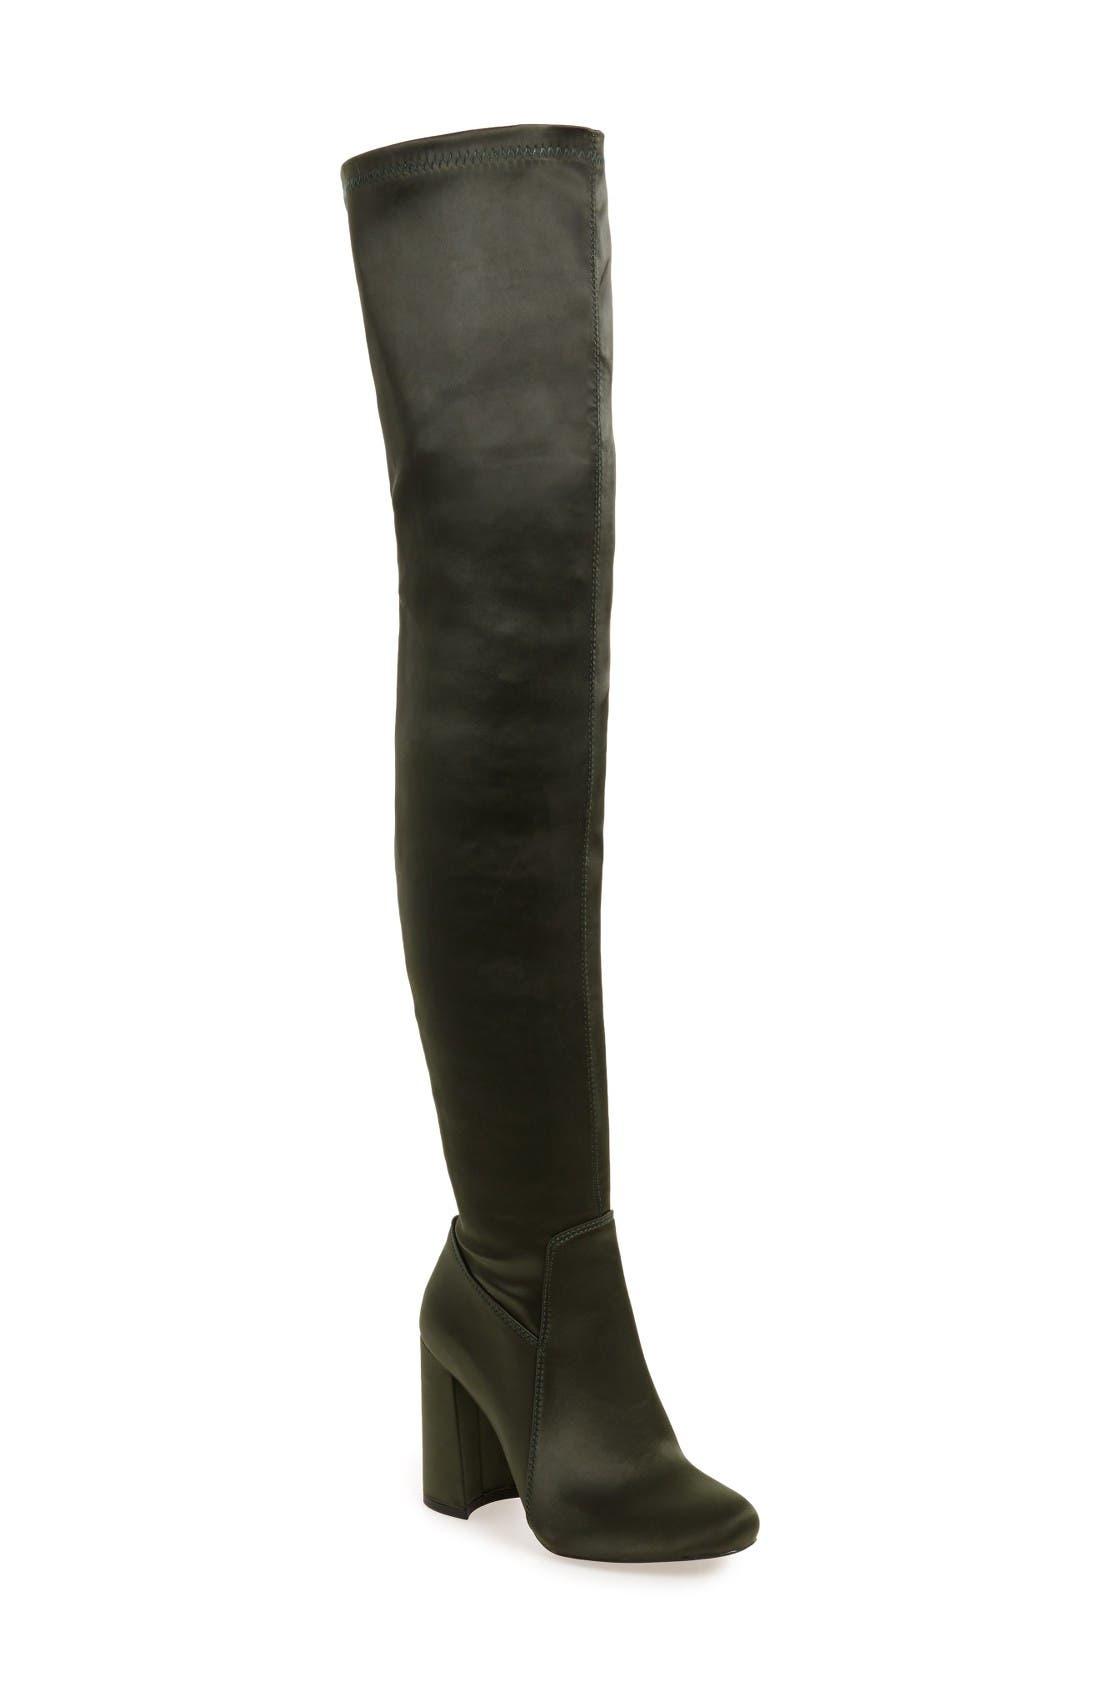 Main Image - Jeffrey Campbell Perouze 2 Thigh High Stretch Boot (Women)